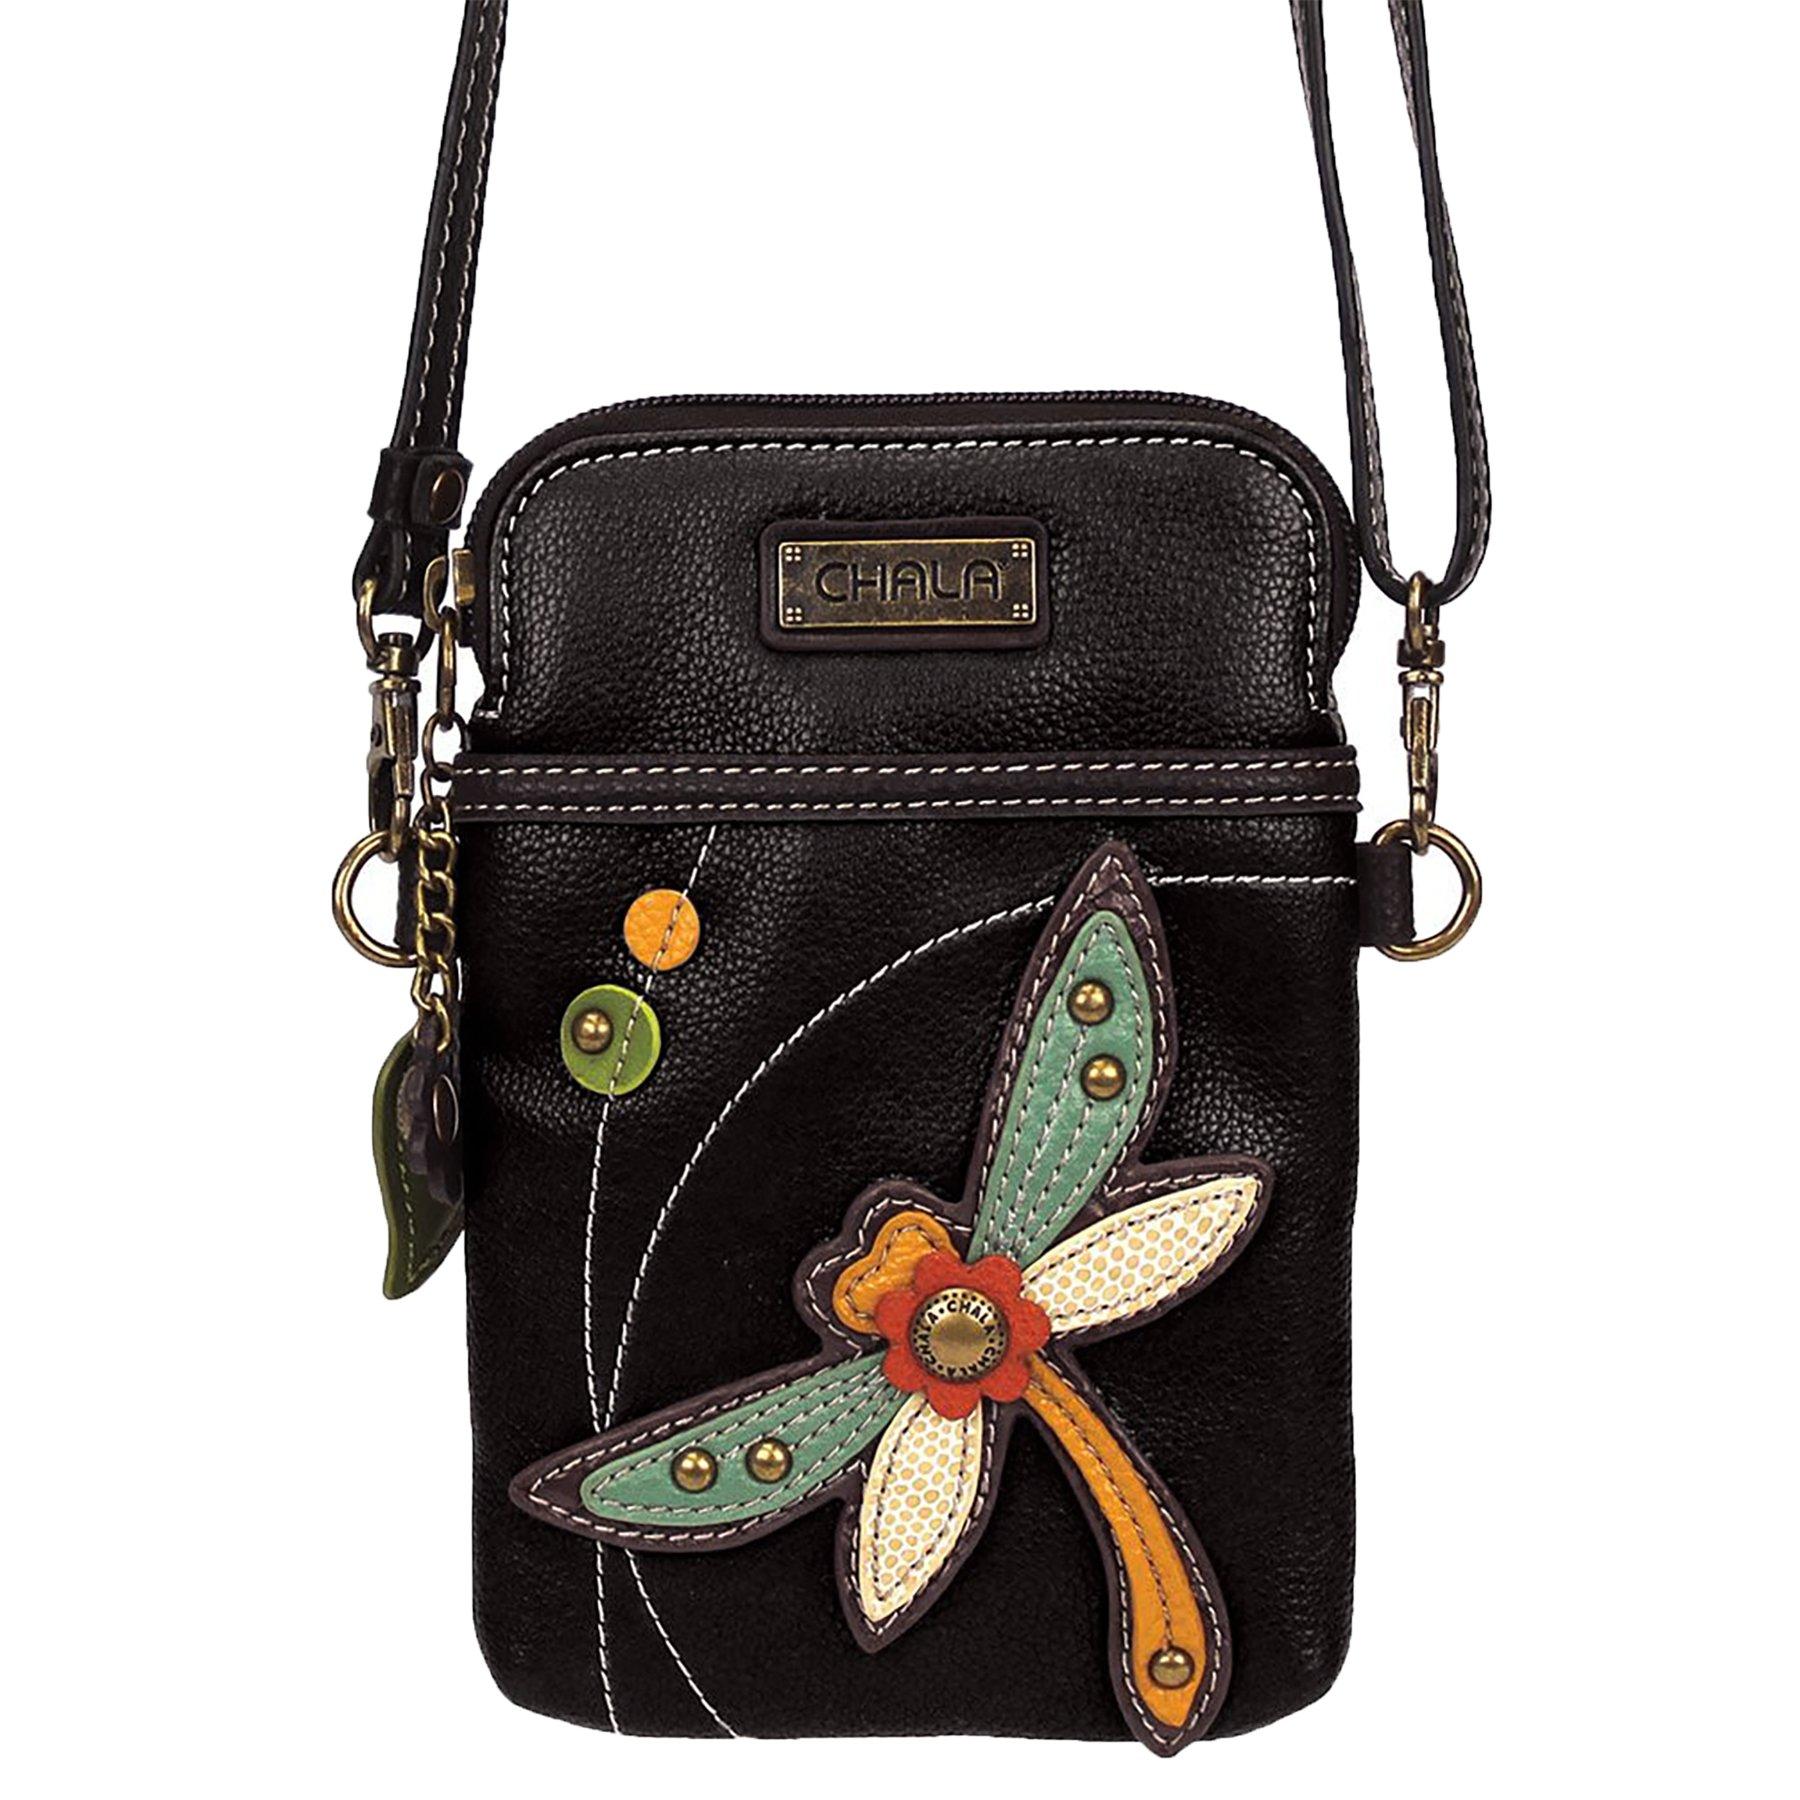 f19c0a7353c Chala Crossbody Cell Phone Purse - Women PU Leather Multicolor Handbag with  Adjustable Strap